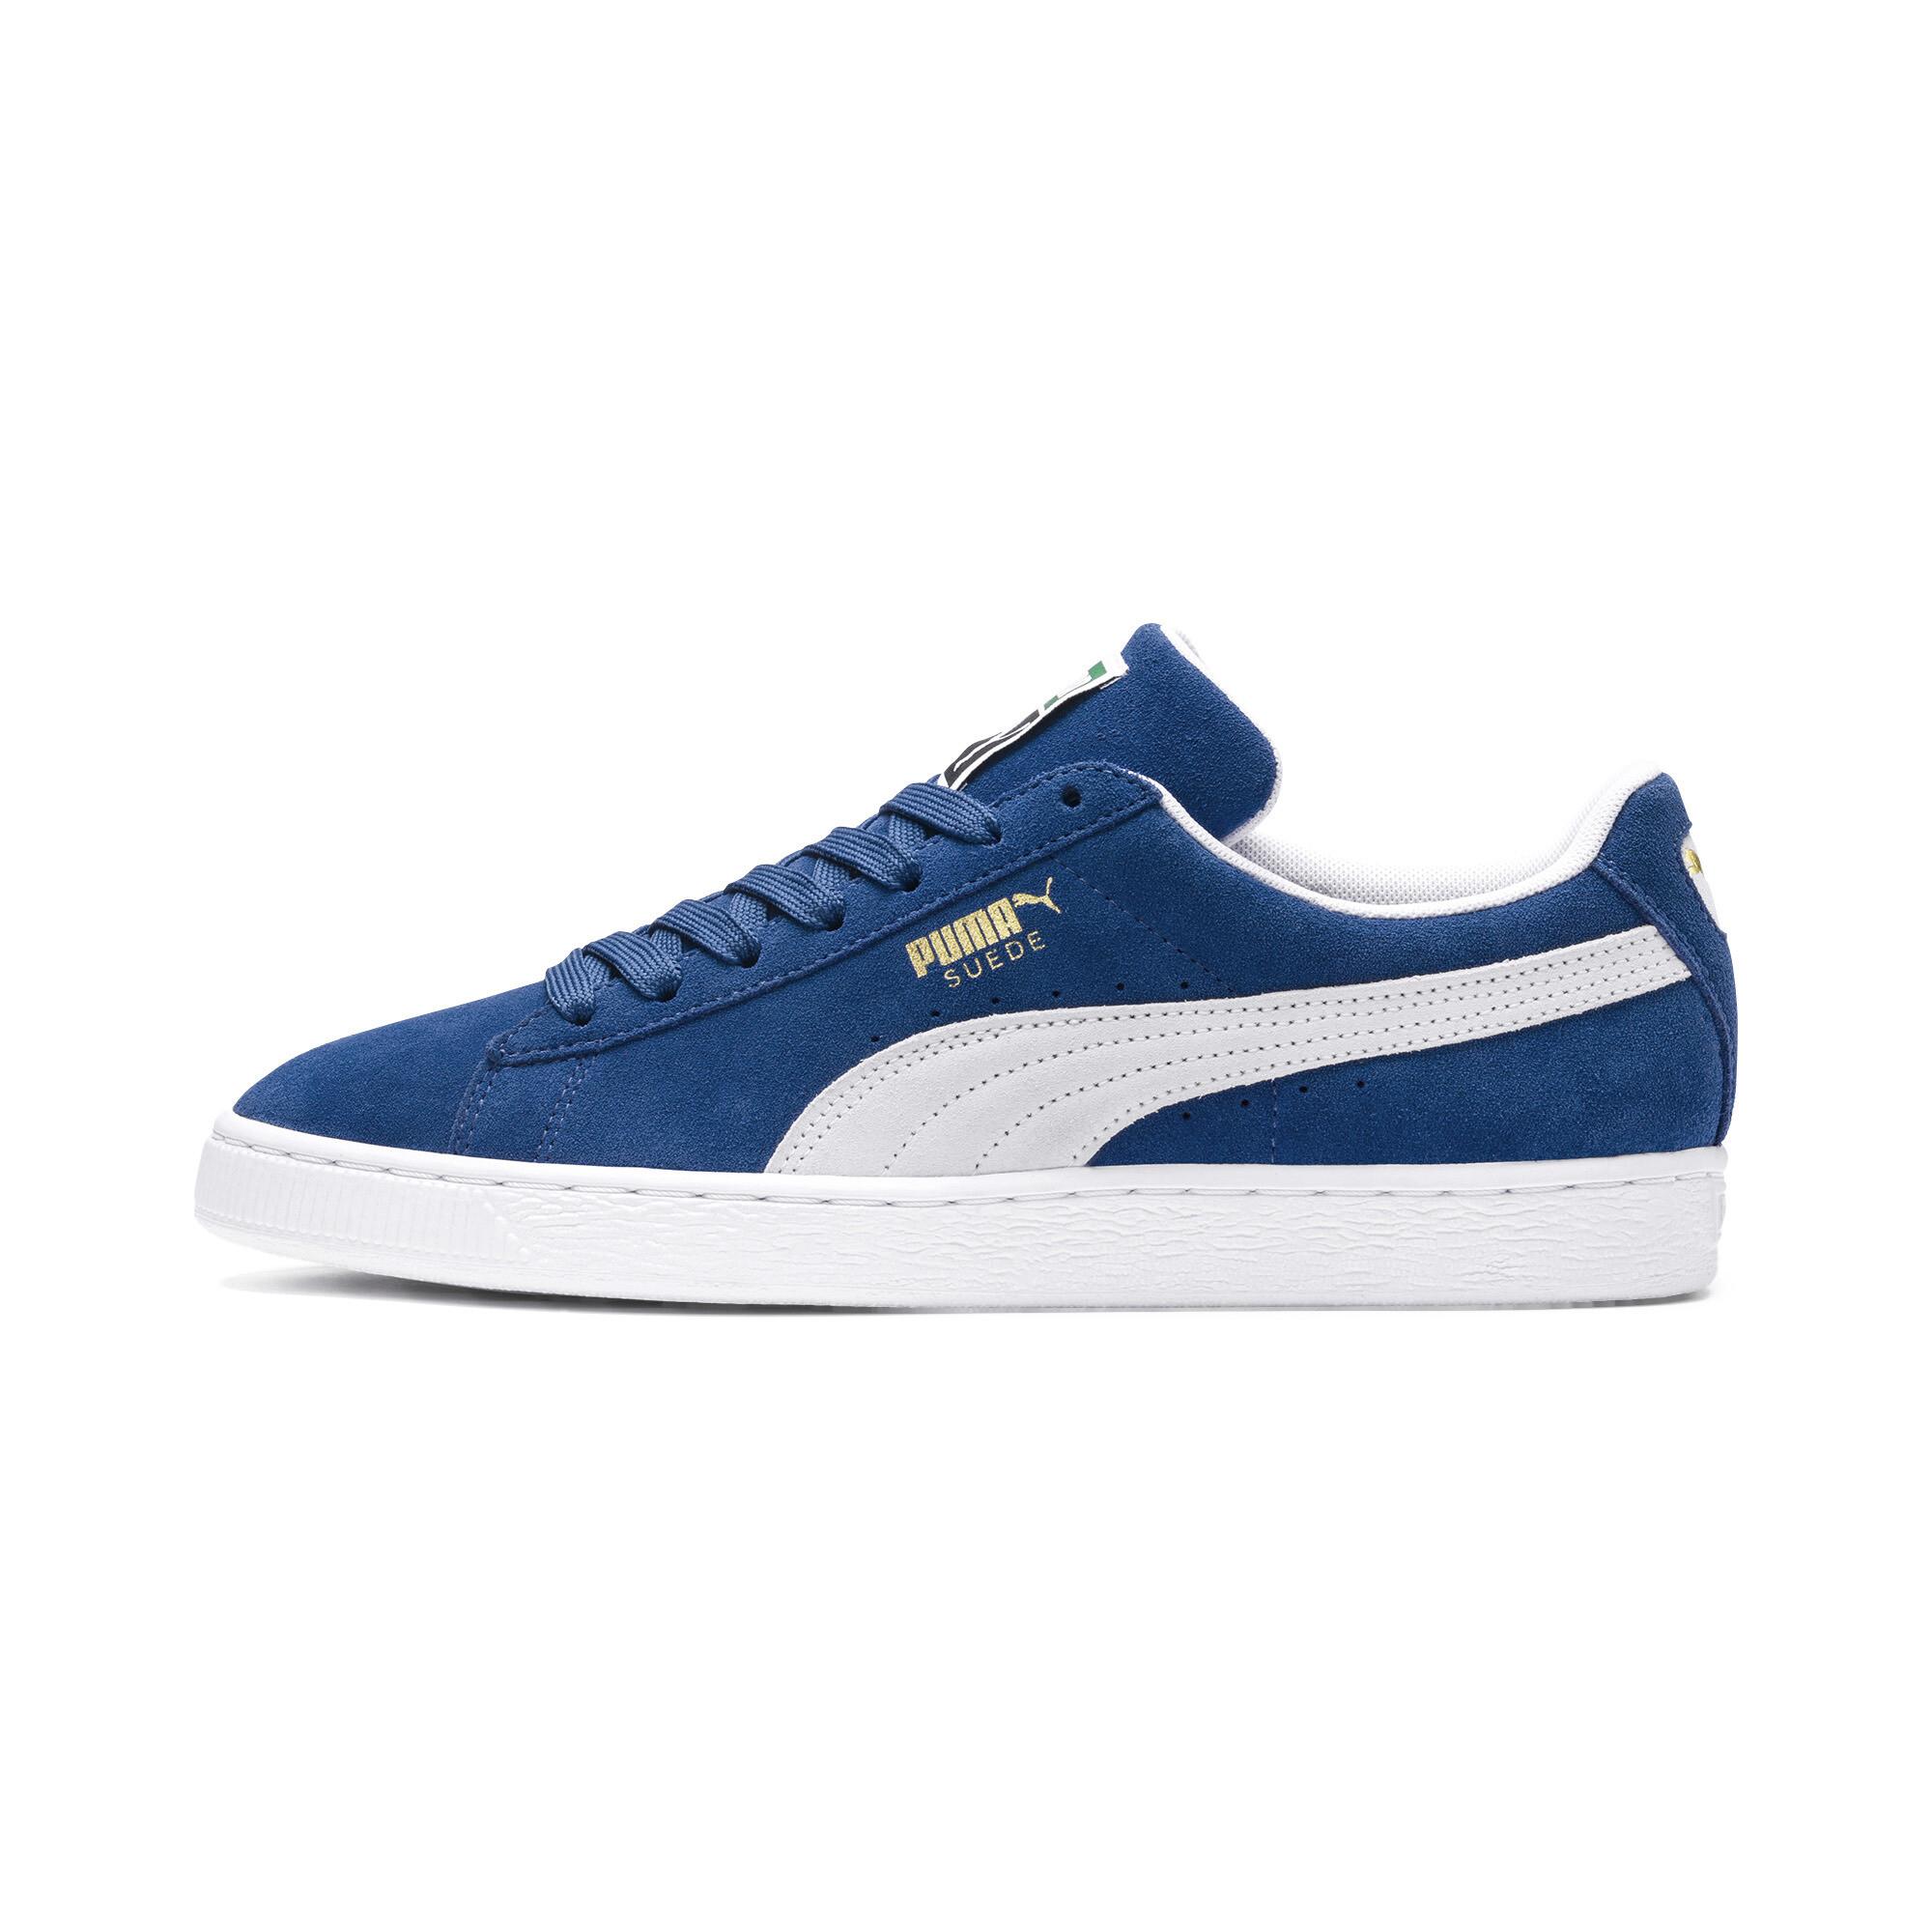 PUMA-Suede-Classic-Sneakers-Men-Shoe-Sport-Shoe thumbnail 10